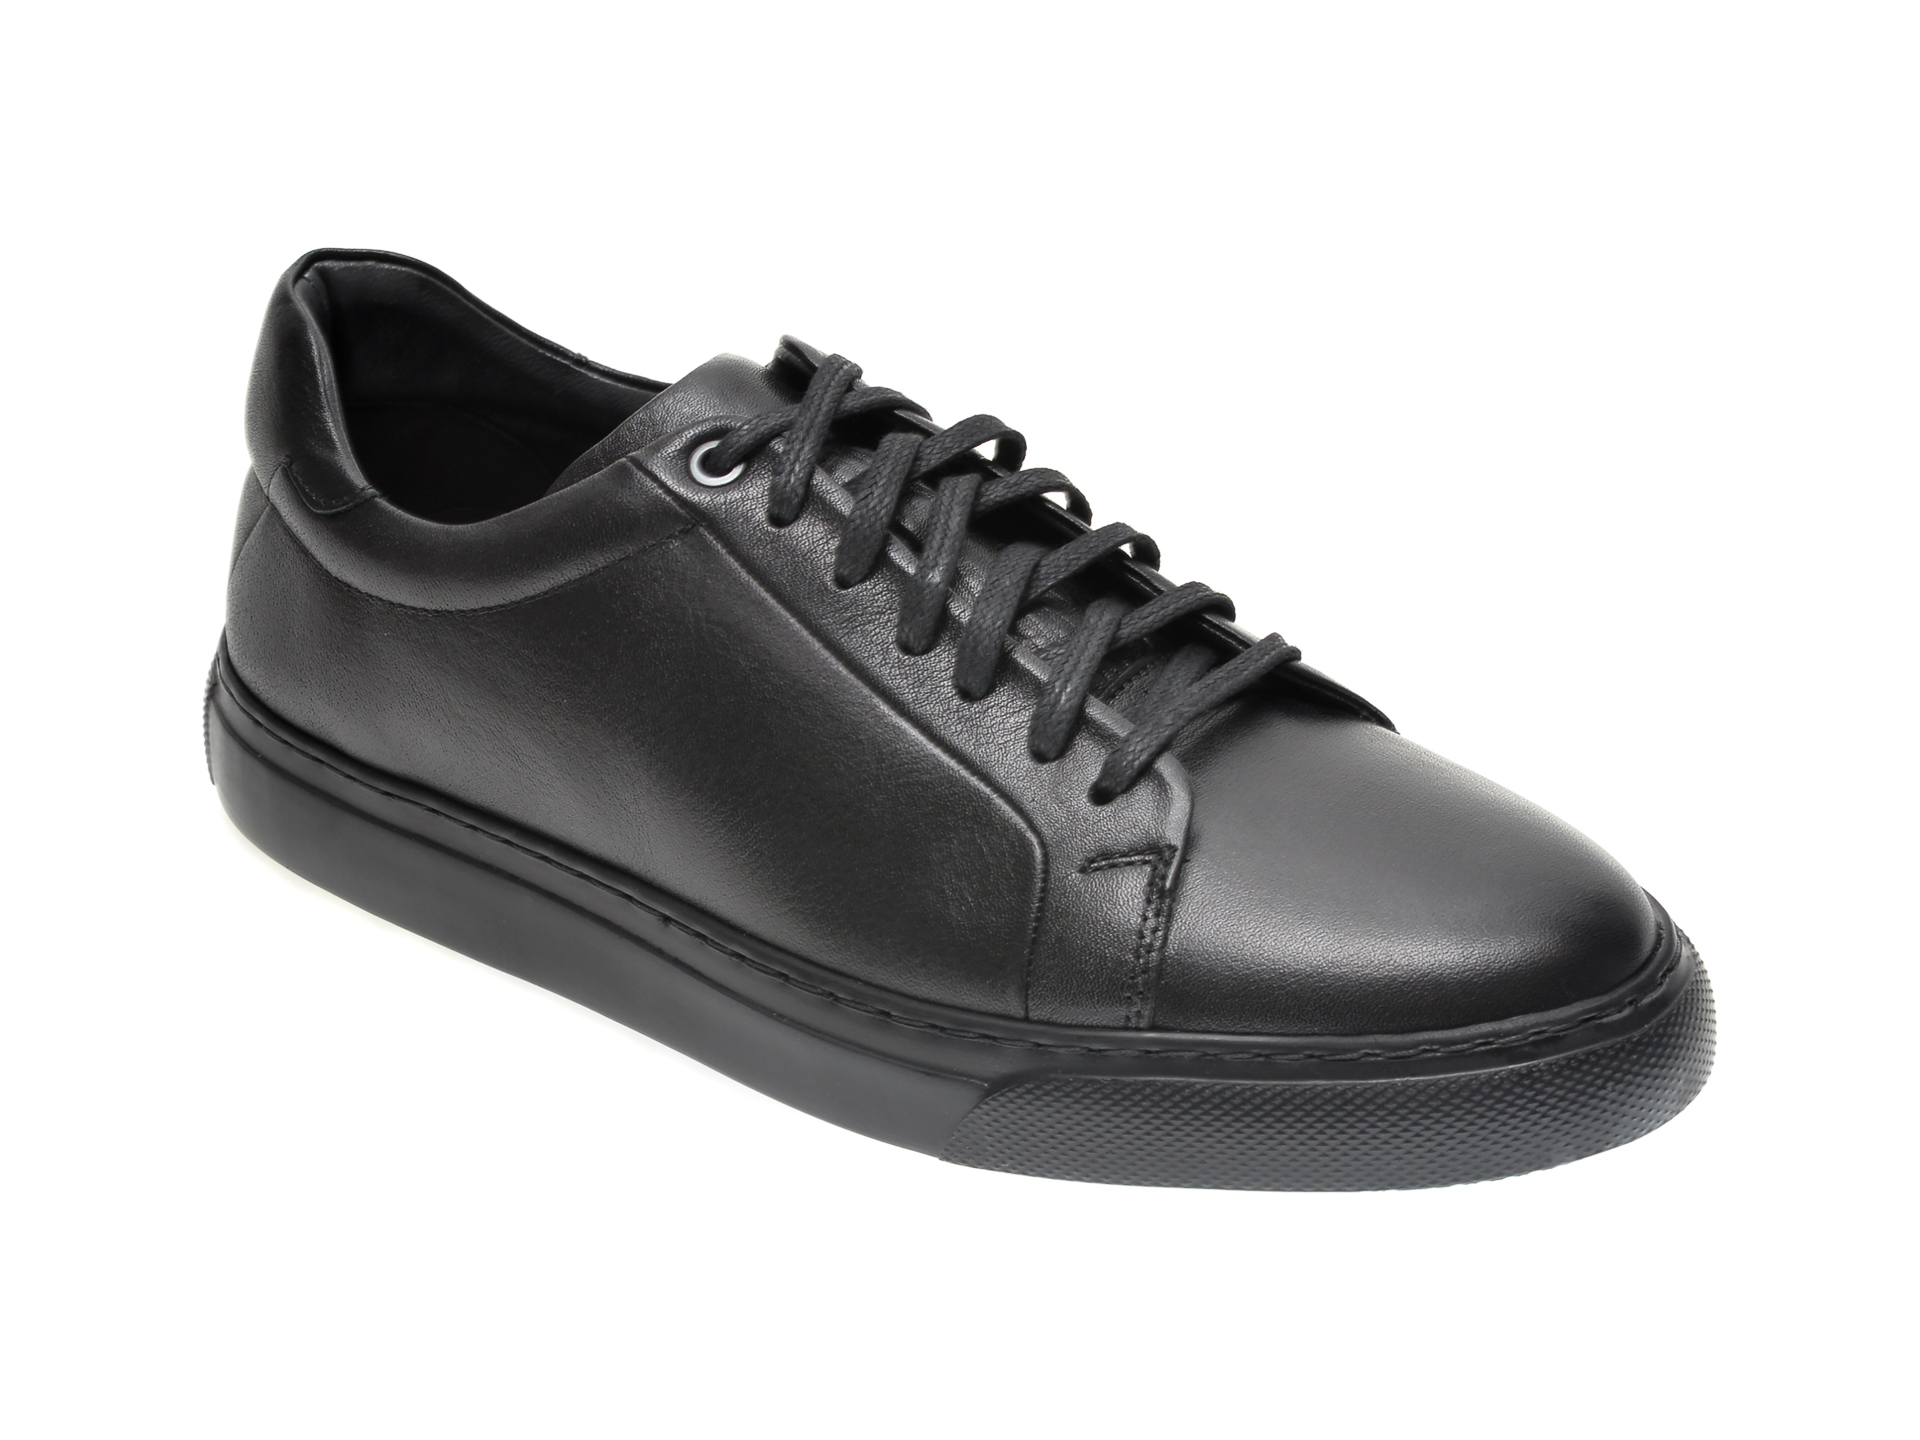 Pantofi OTTER negri, 20BF302, din piele naturala New